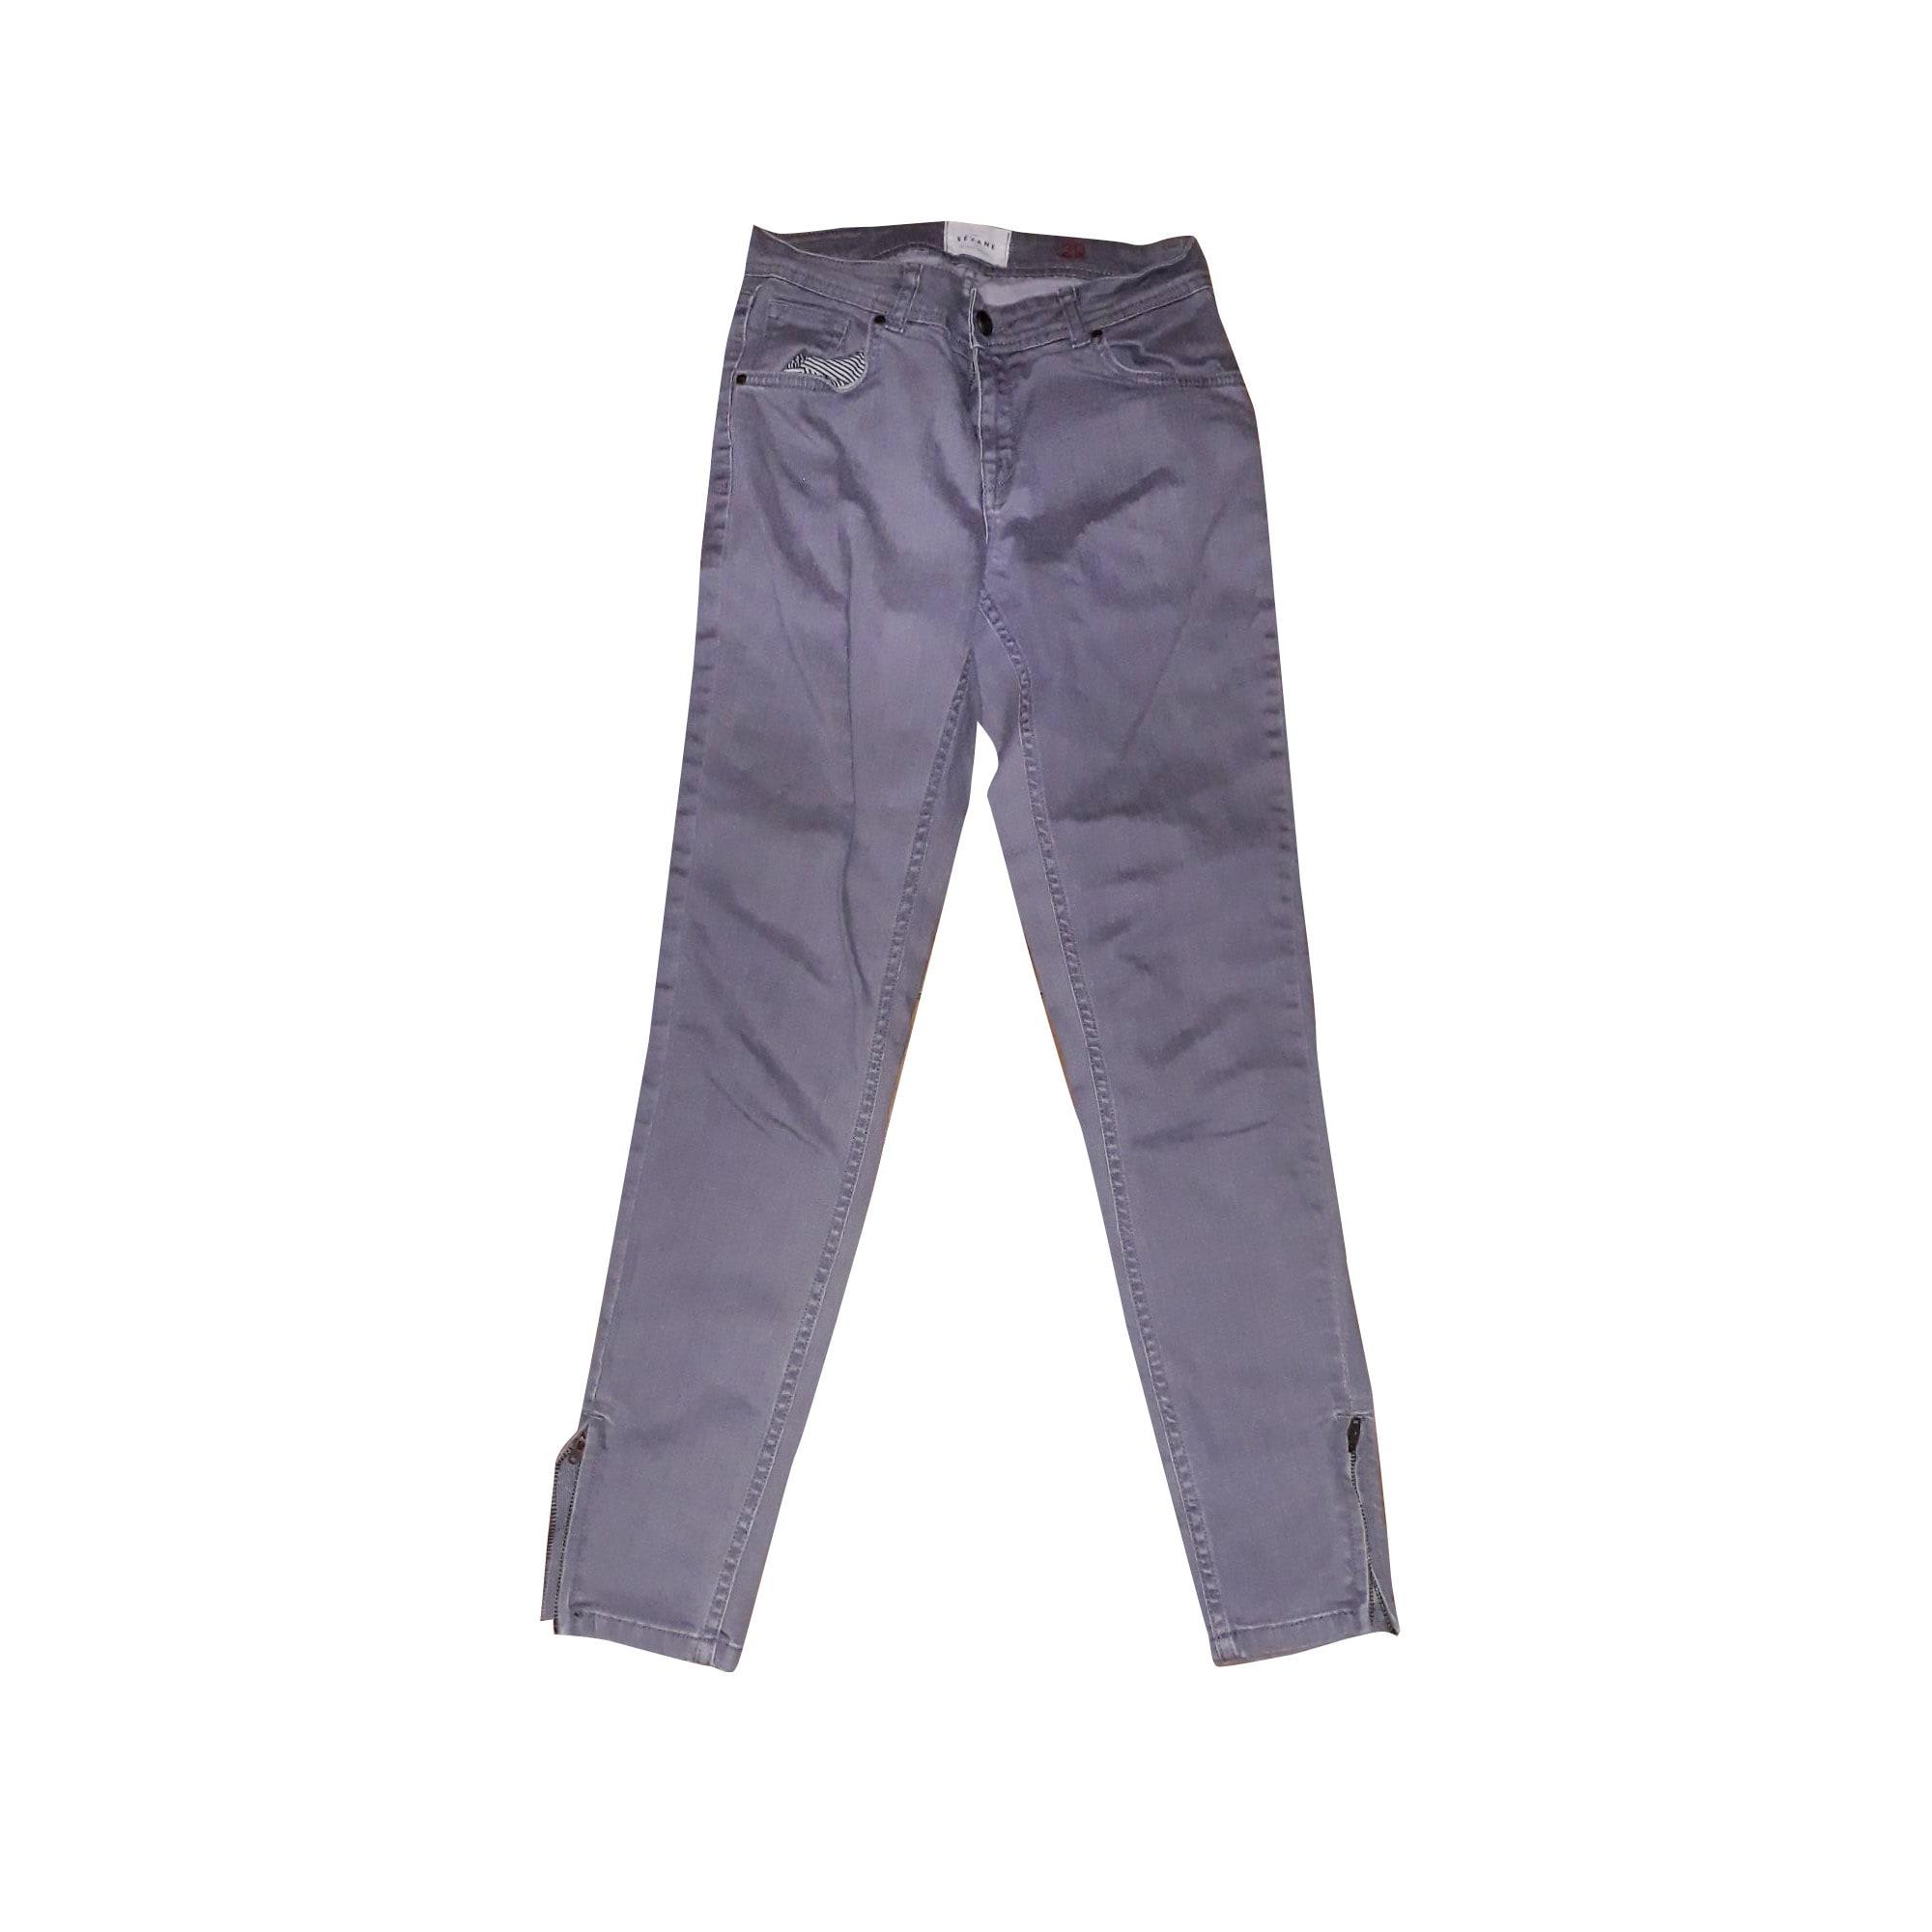 Jeans slim SÉZANE Grigio, antracite